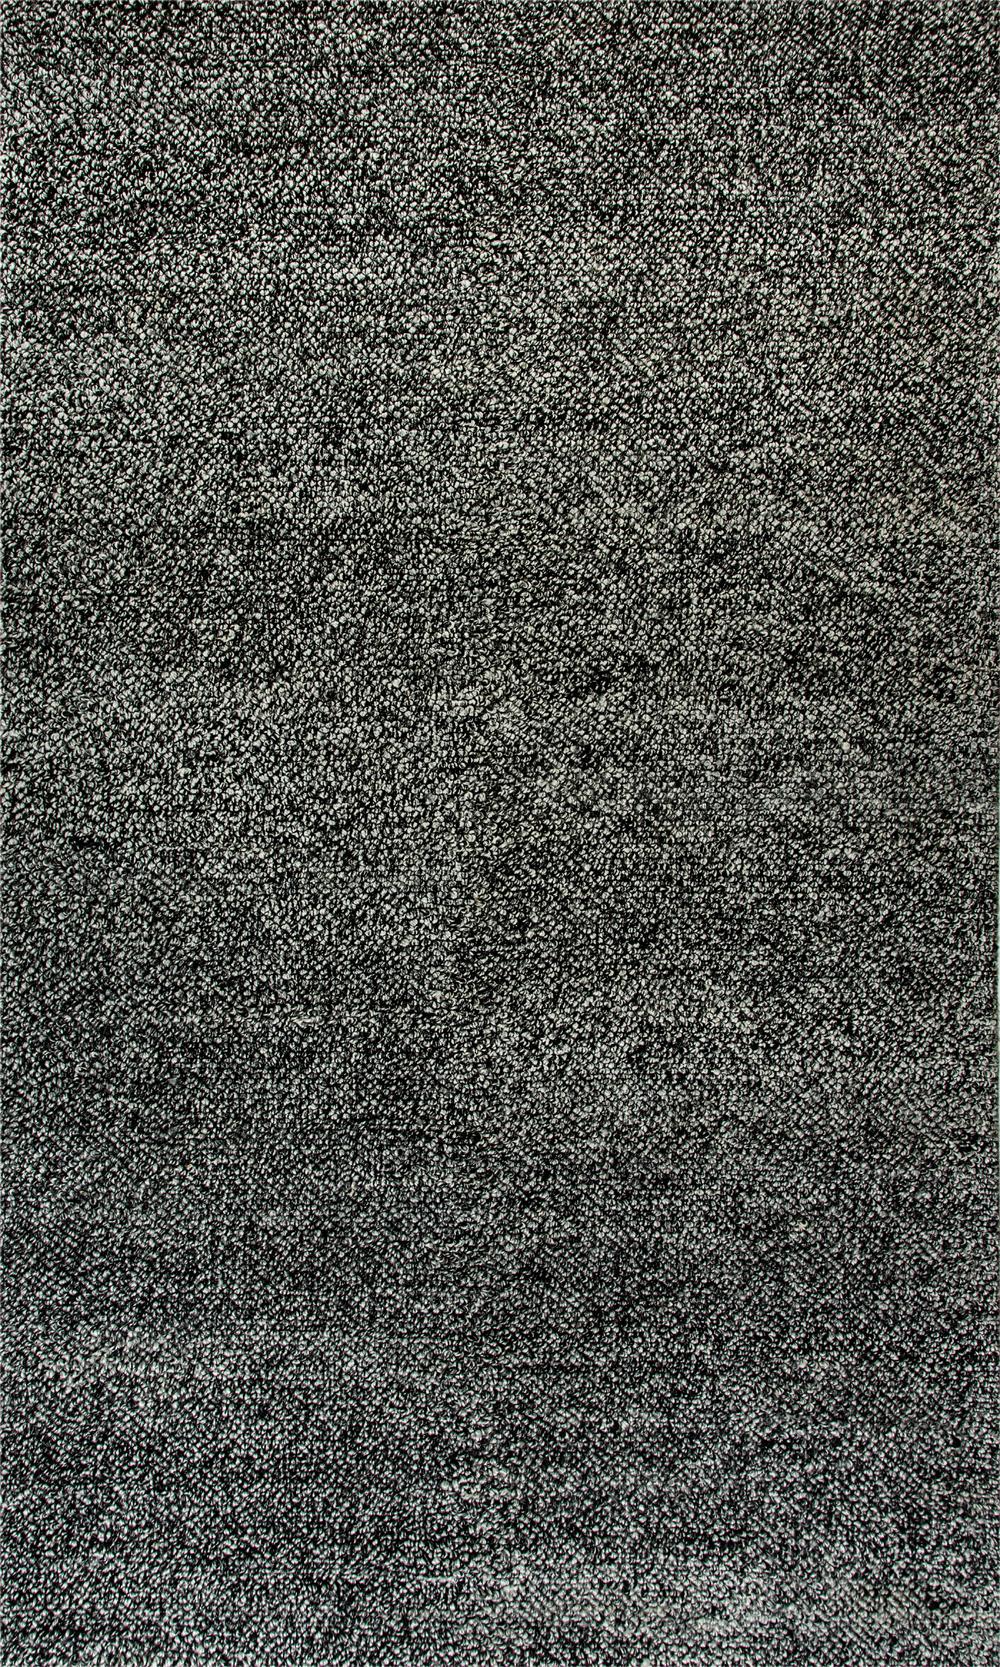 Dynamic ZEST 40803 IVORY/GREY Rug